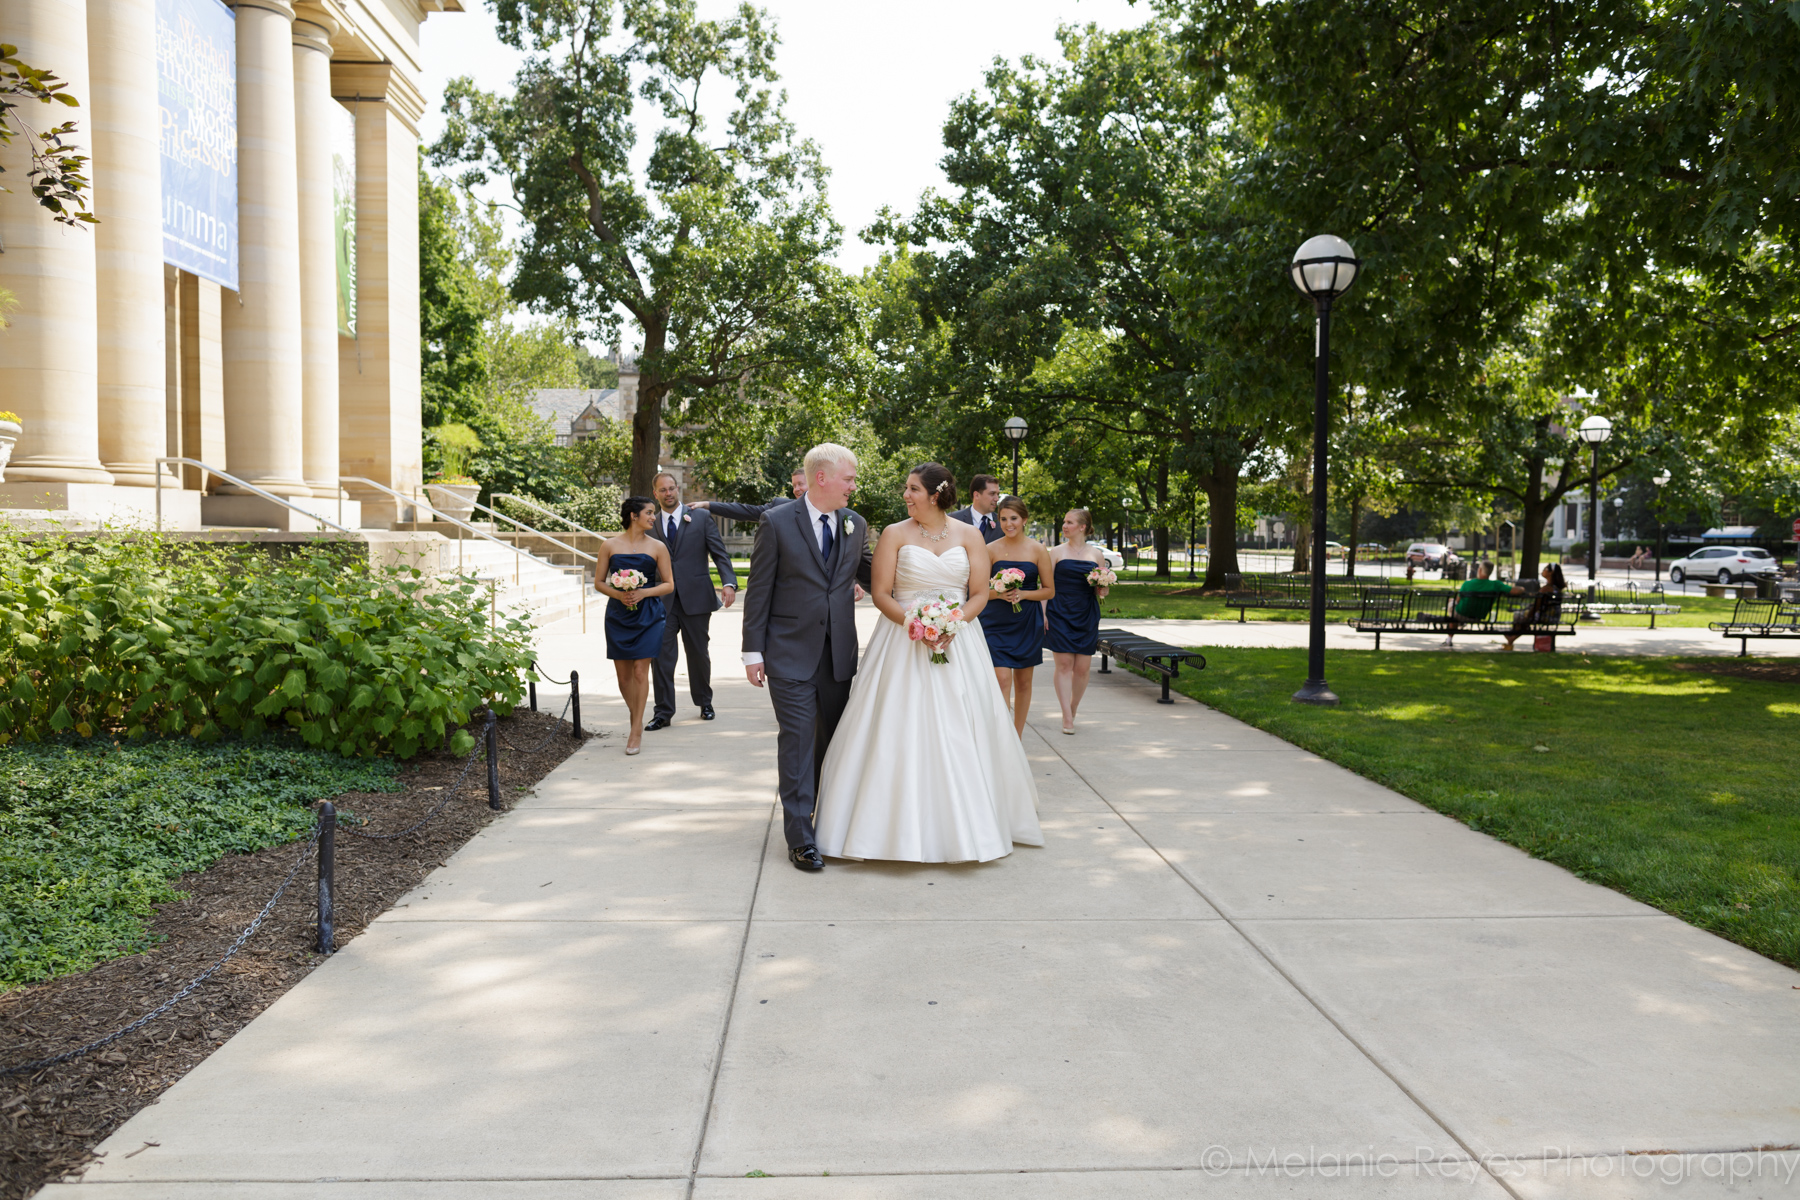 MC_annarbor_uofm_wedding_027